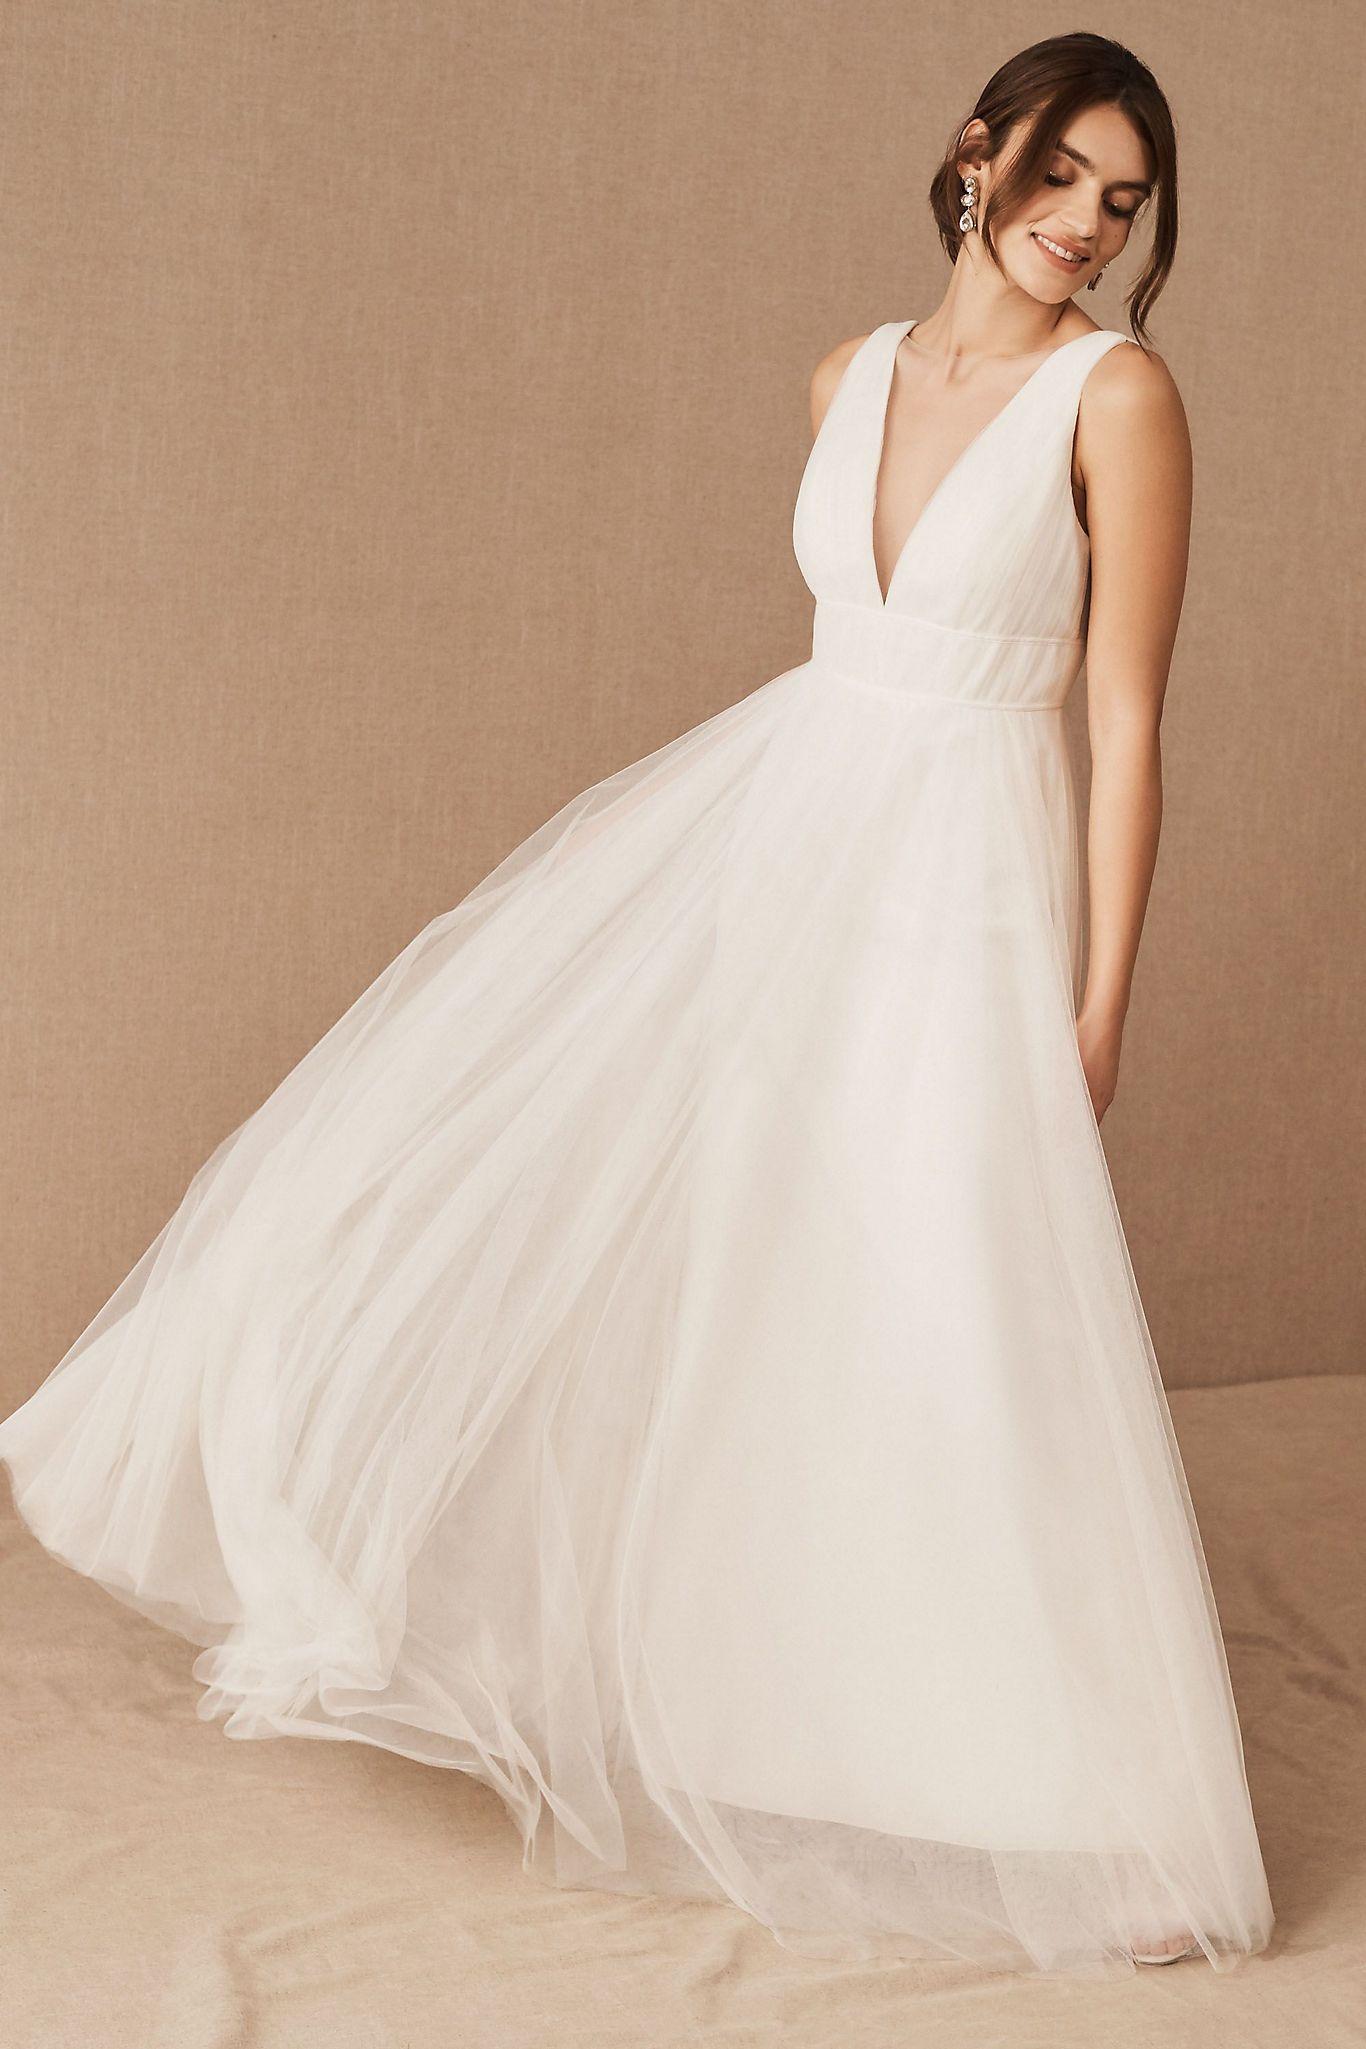 Jenny Yoo Sarita Dress Anthropologie In 2020 Wedding Dresses Under 500 Dresses Classic Wedding Dress